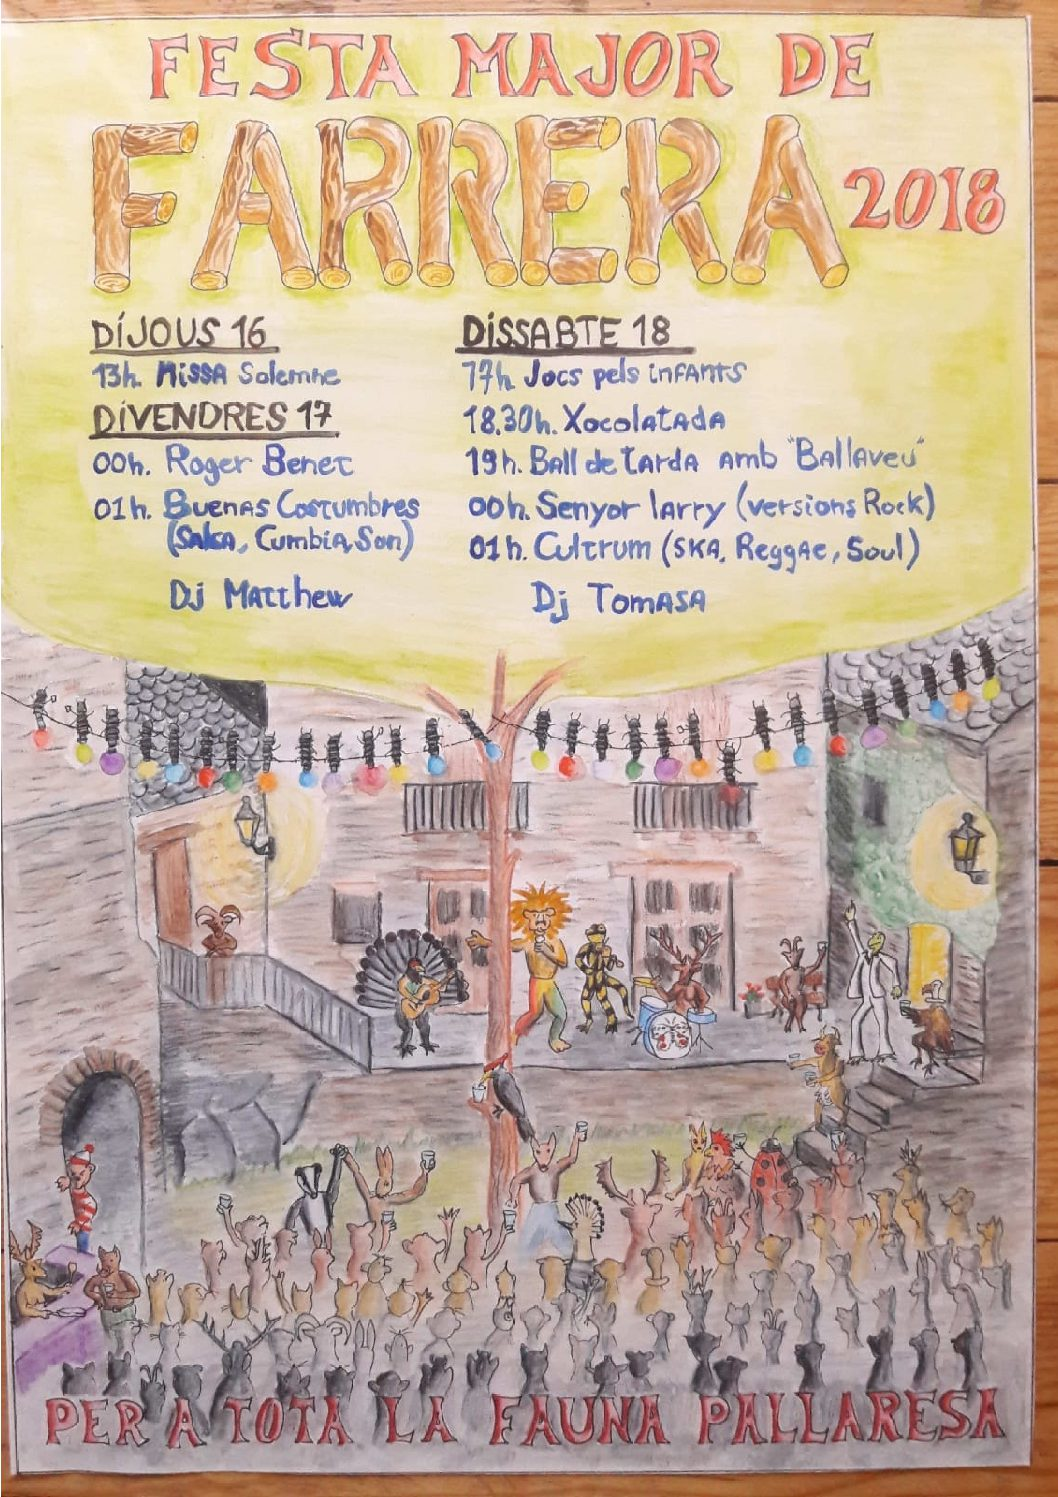 Festa Major de Farrera, 2018